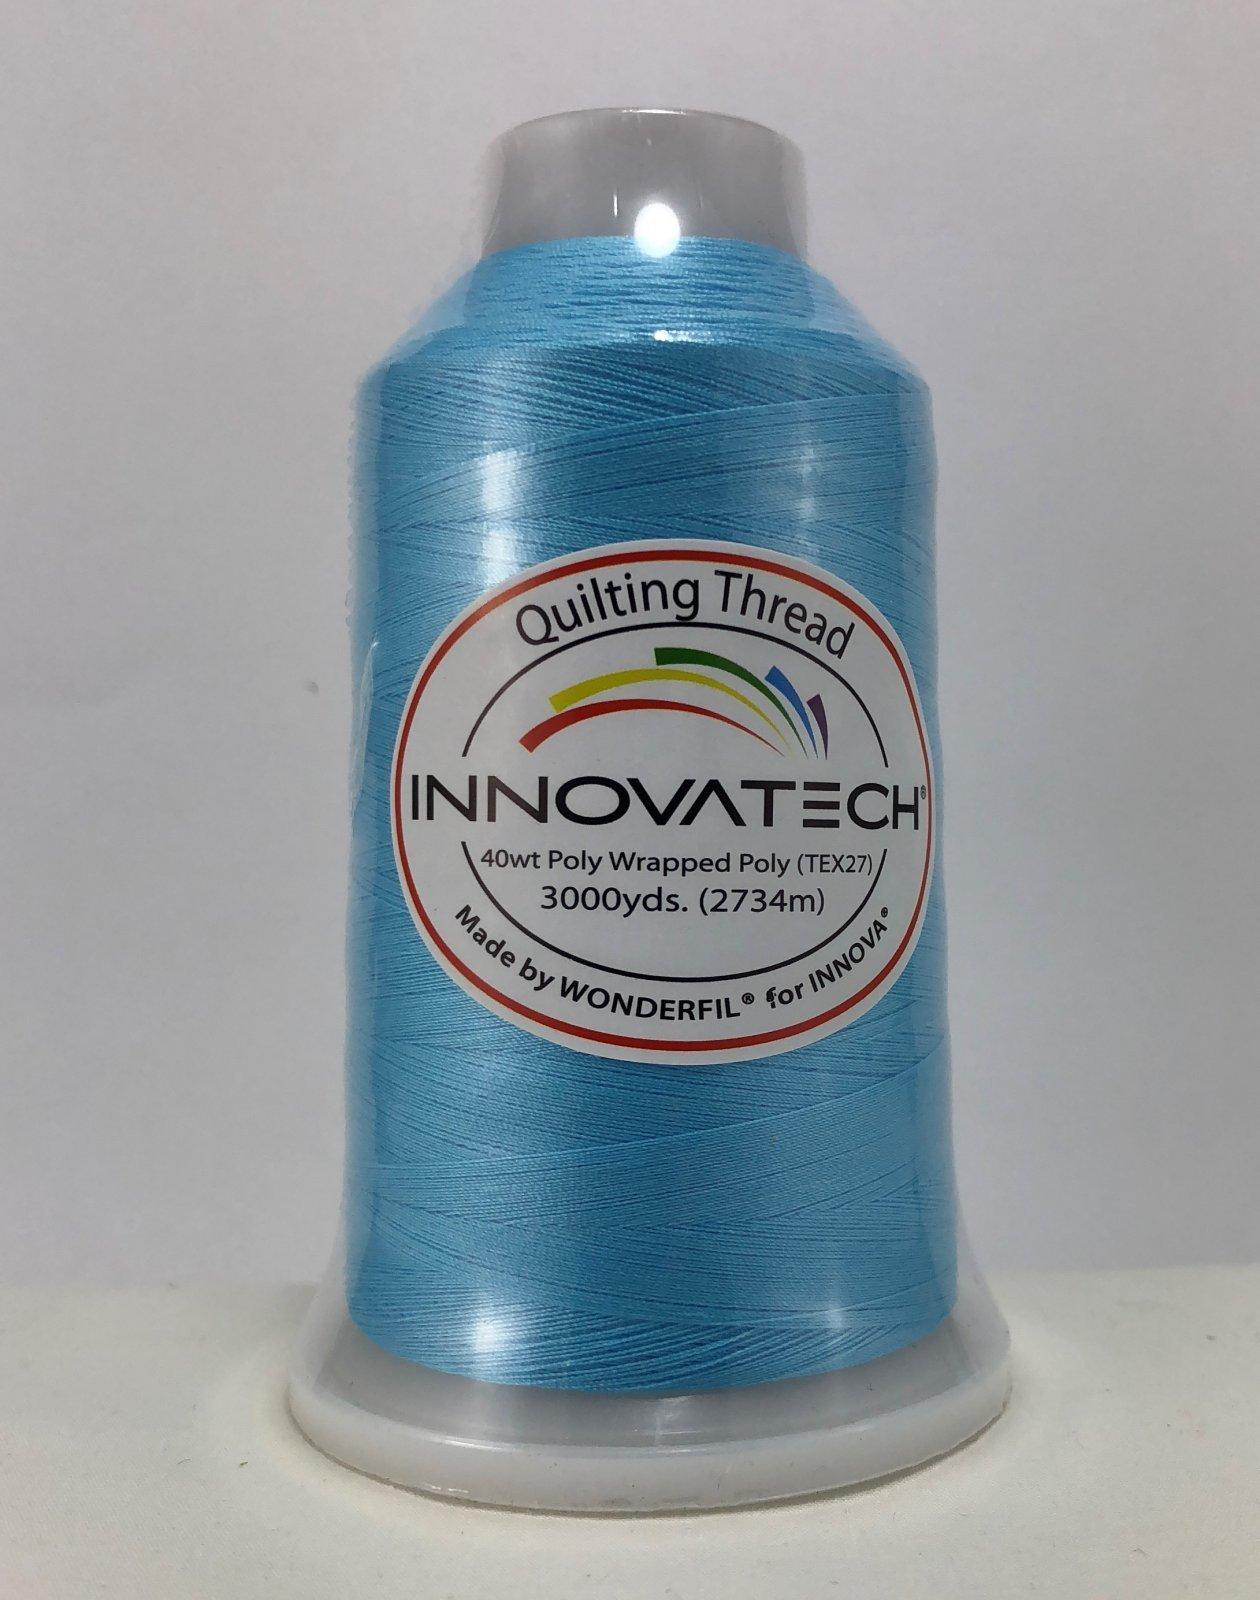 Innovatech Thread Ocean